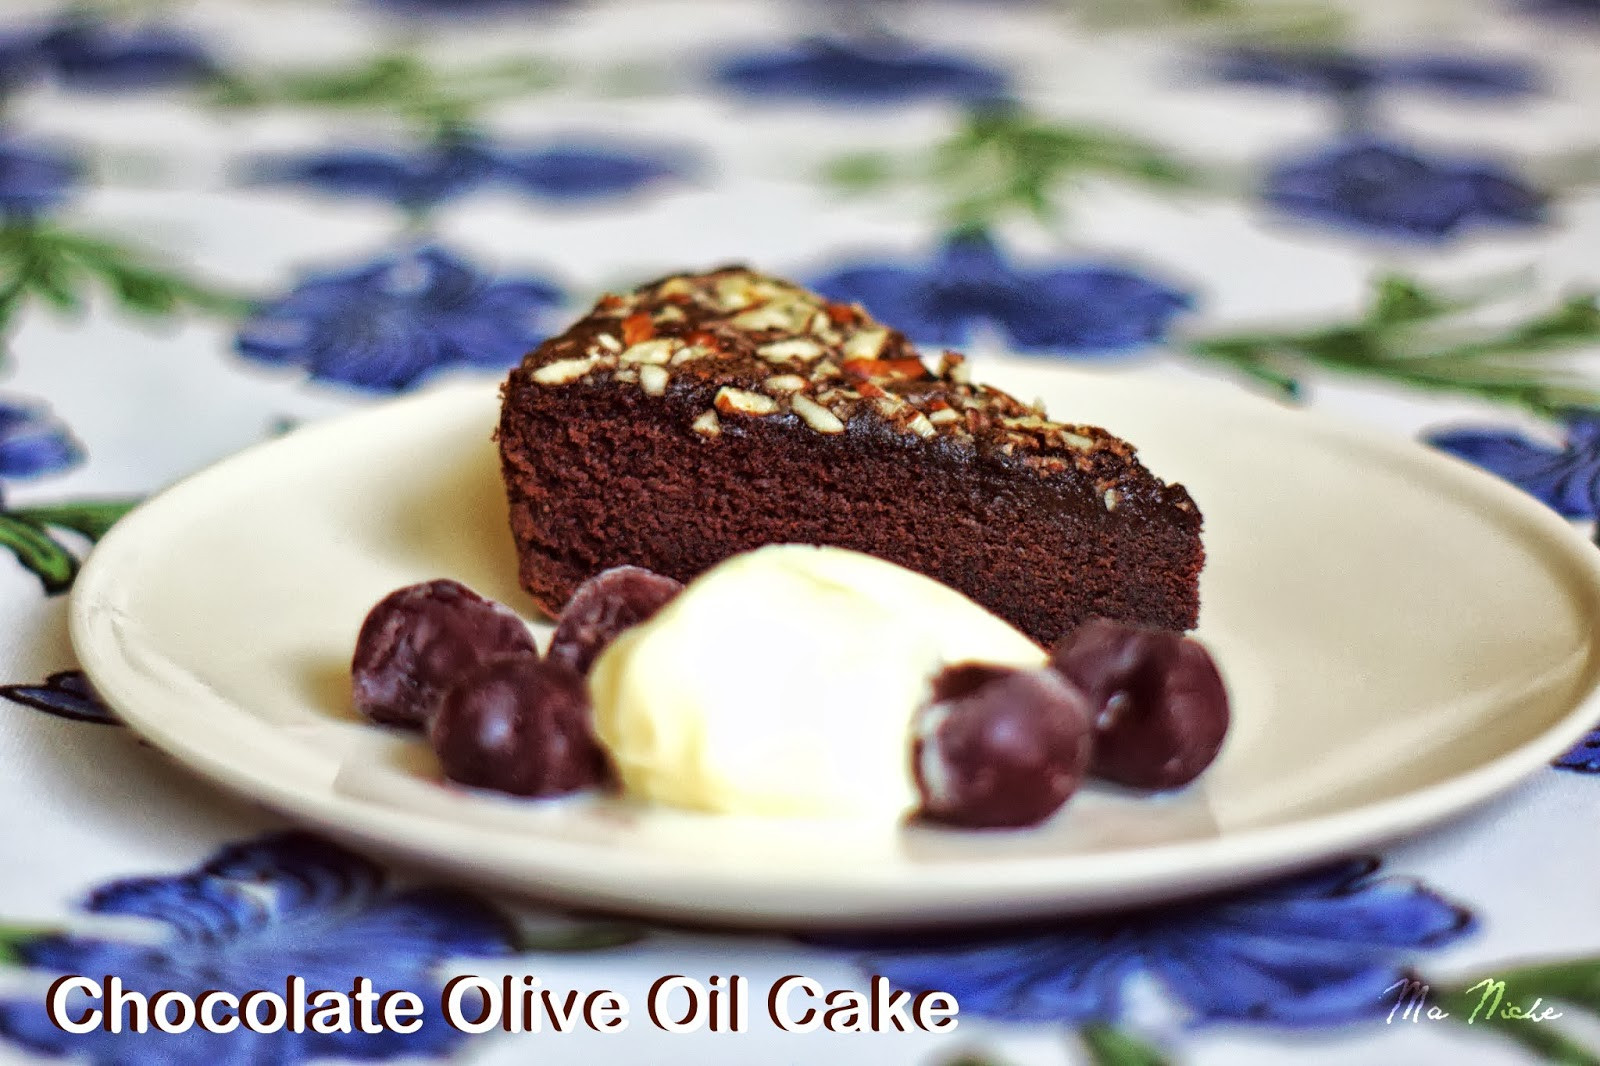 Chocolate Olive Oil Cake  Ma Niche Chocolate Olive Oil Cake Nigella Lawson